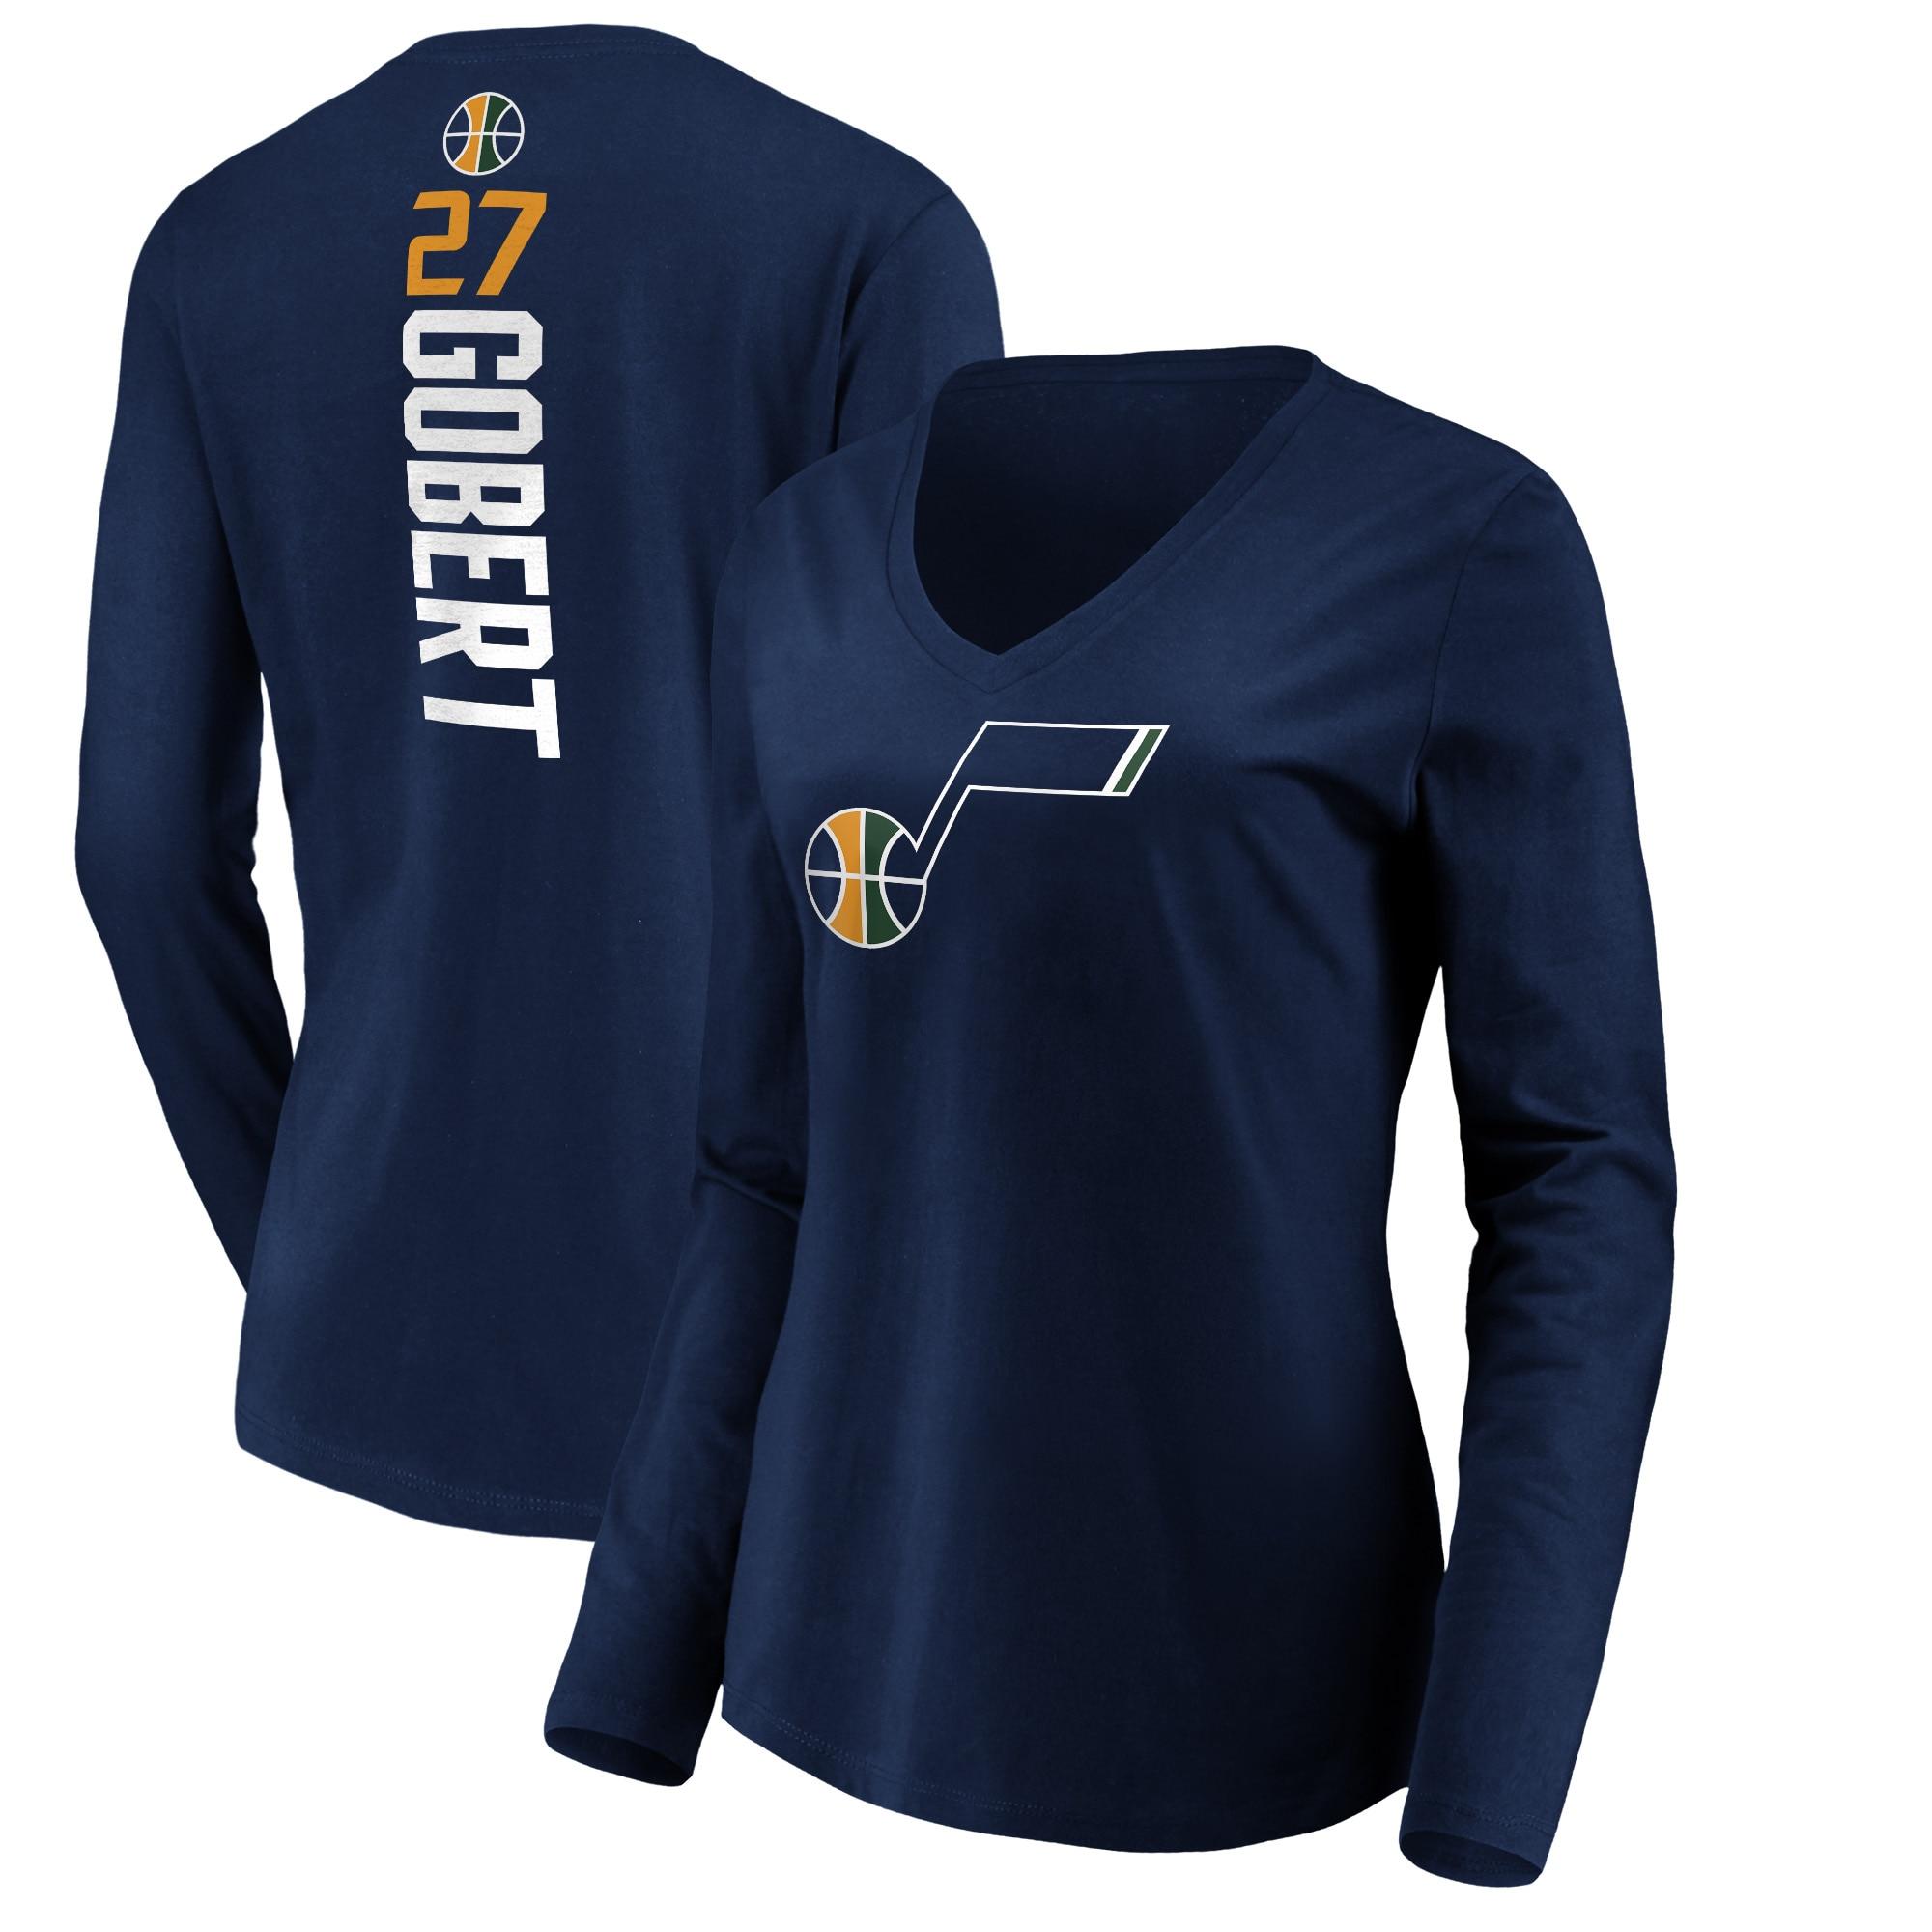 Rudy Gobert Utah Jazz Fanatics Branded Women's Playmaker Name & Number Long Sleeve T-Shirt - Navy